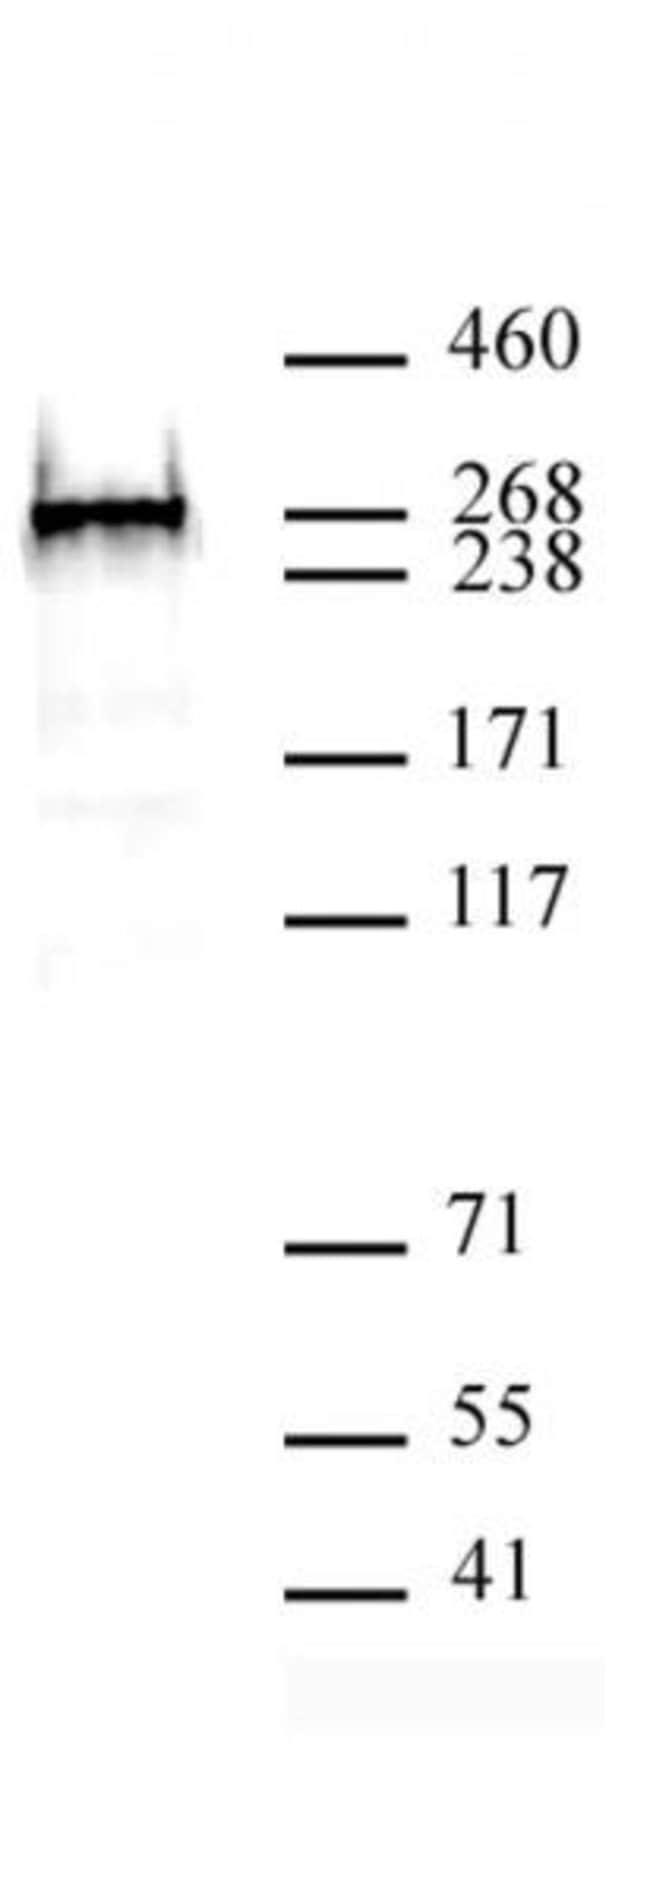 BAZ2A Rabbit anti-Human, Unconjugated, Polyclonal, Active Motif:Antibodies:Primary